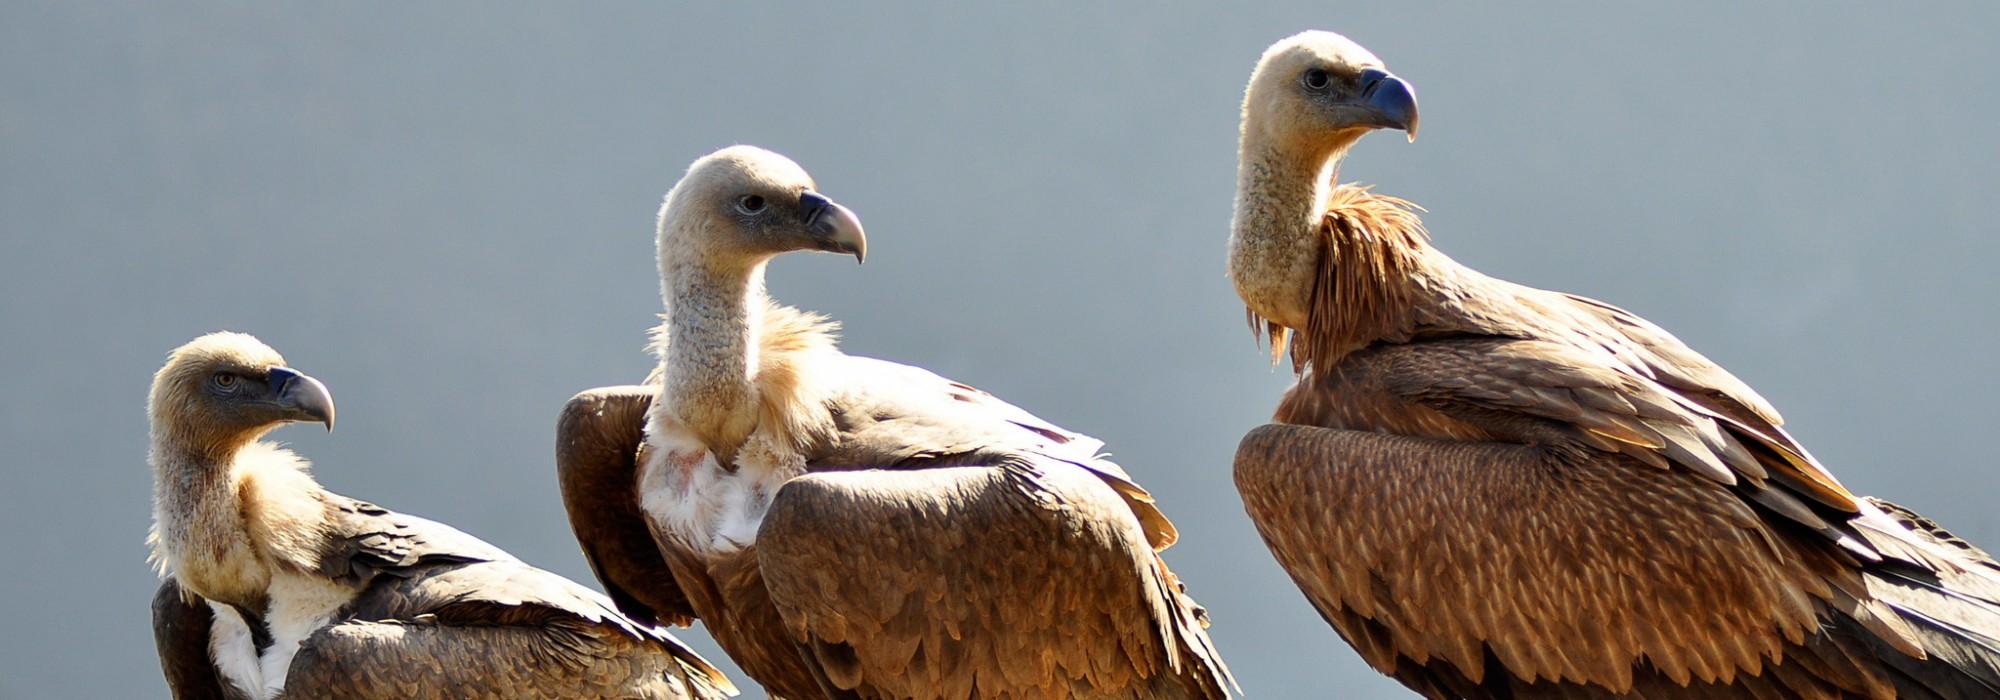 1 petit, 2 petits, 3 petits vautours ! Patrick Lutherer